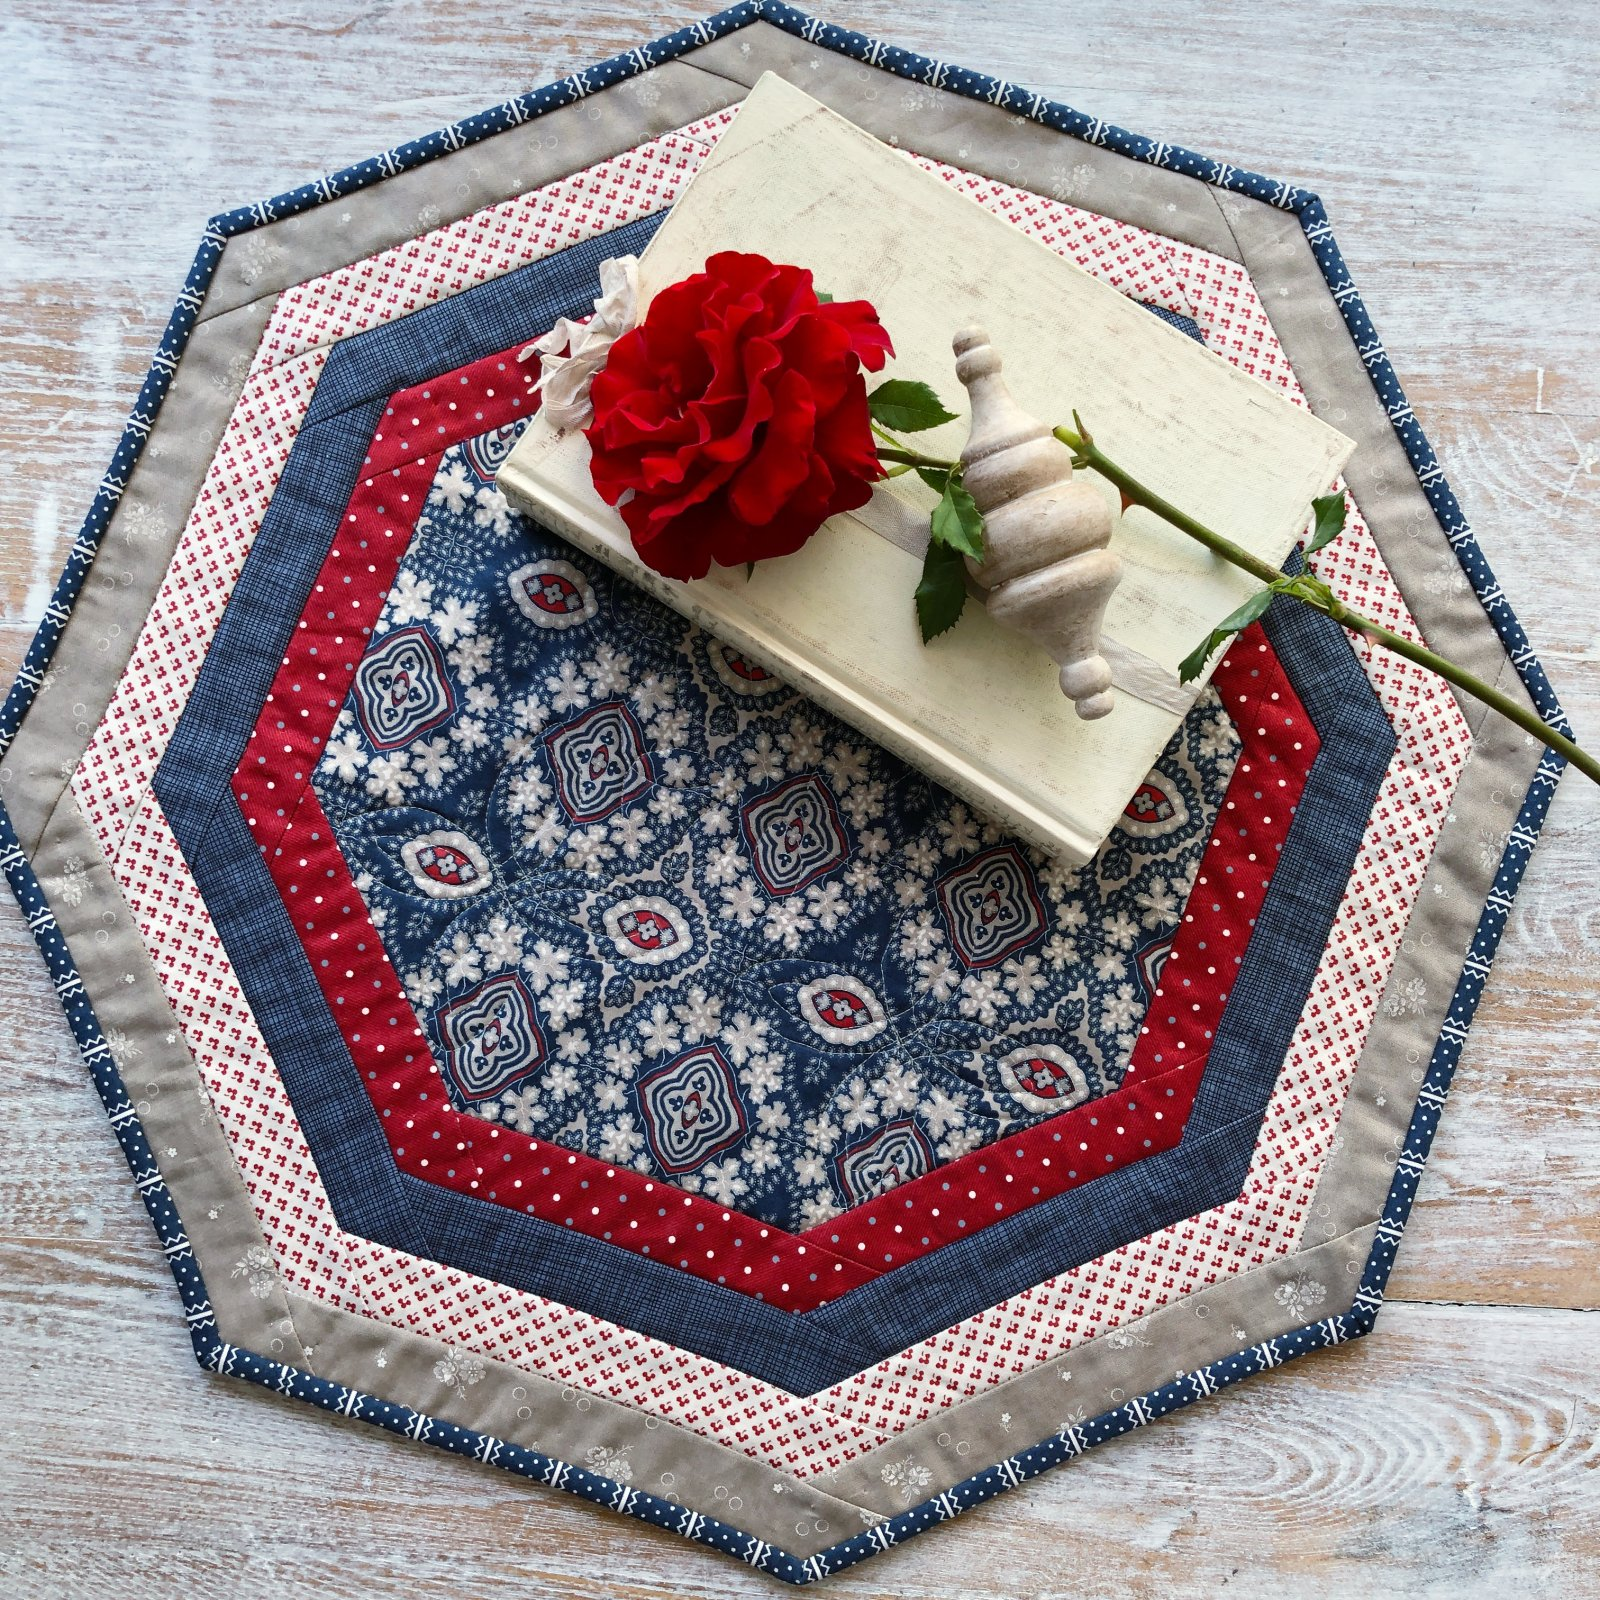 Centerpiece Tablemat - Minick & Simpson